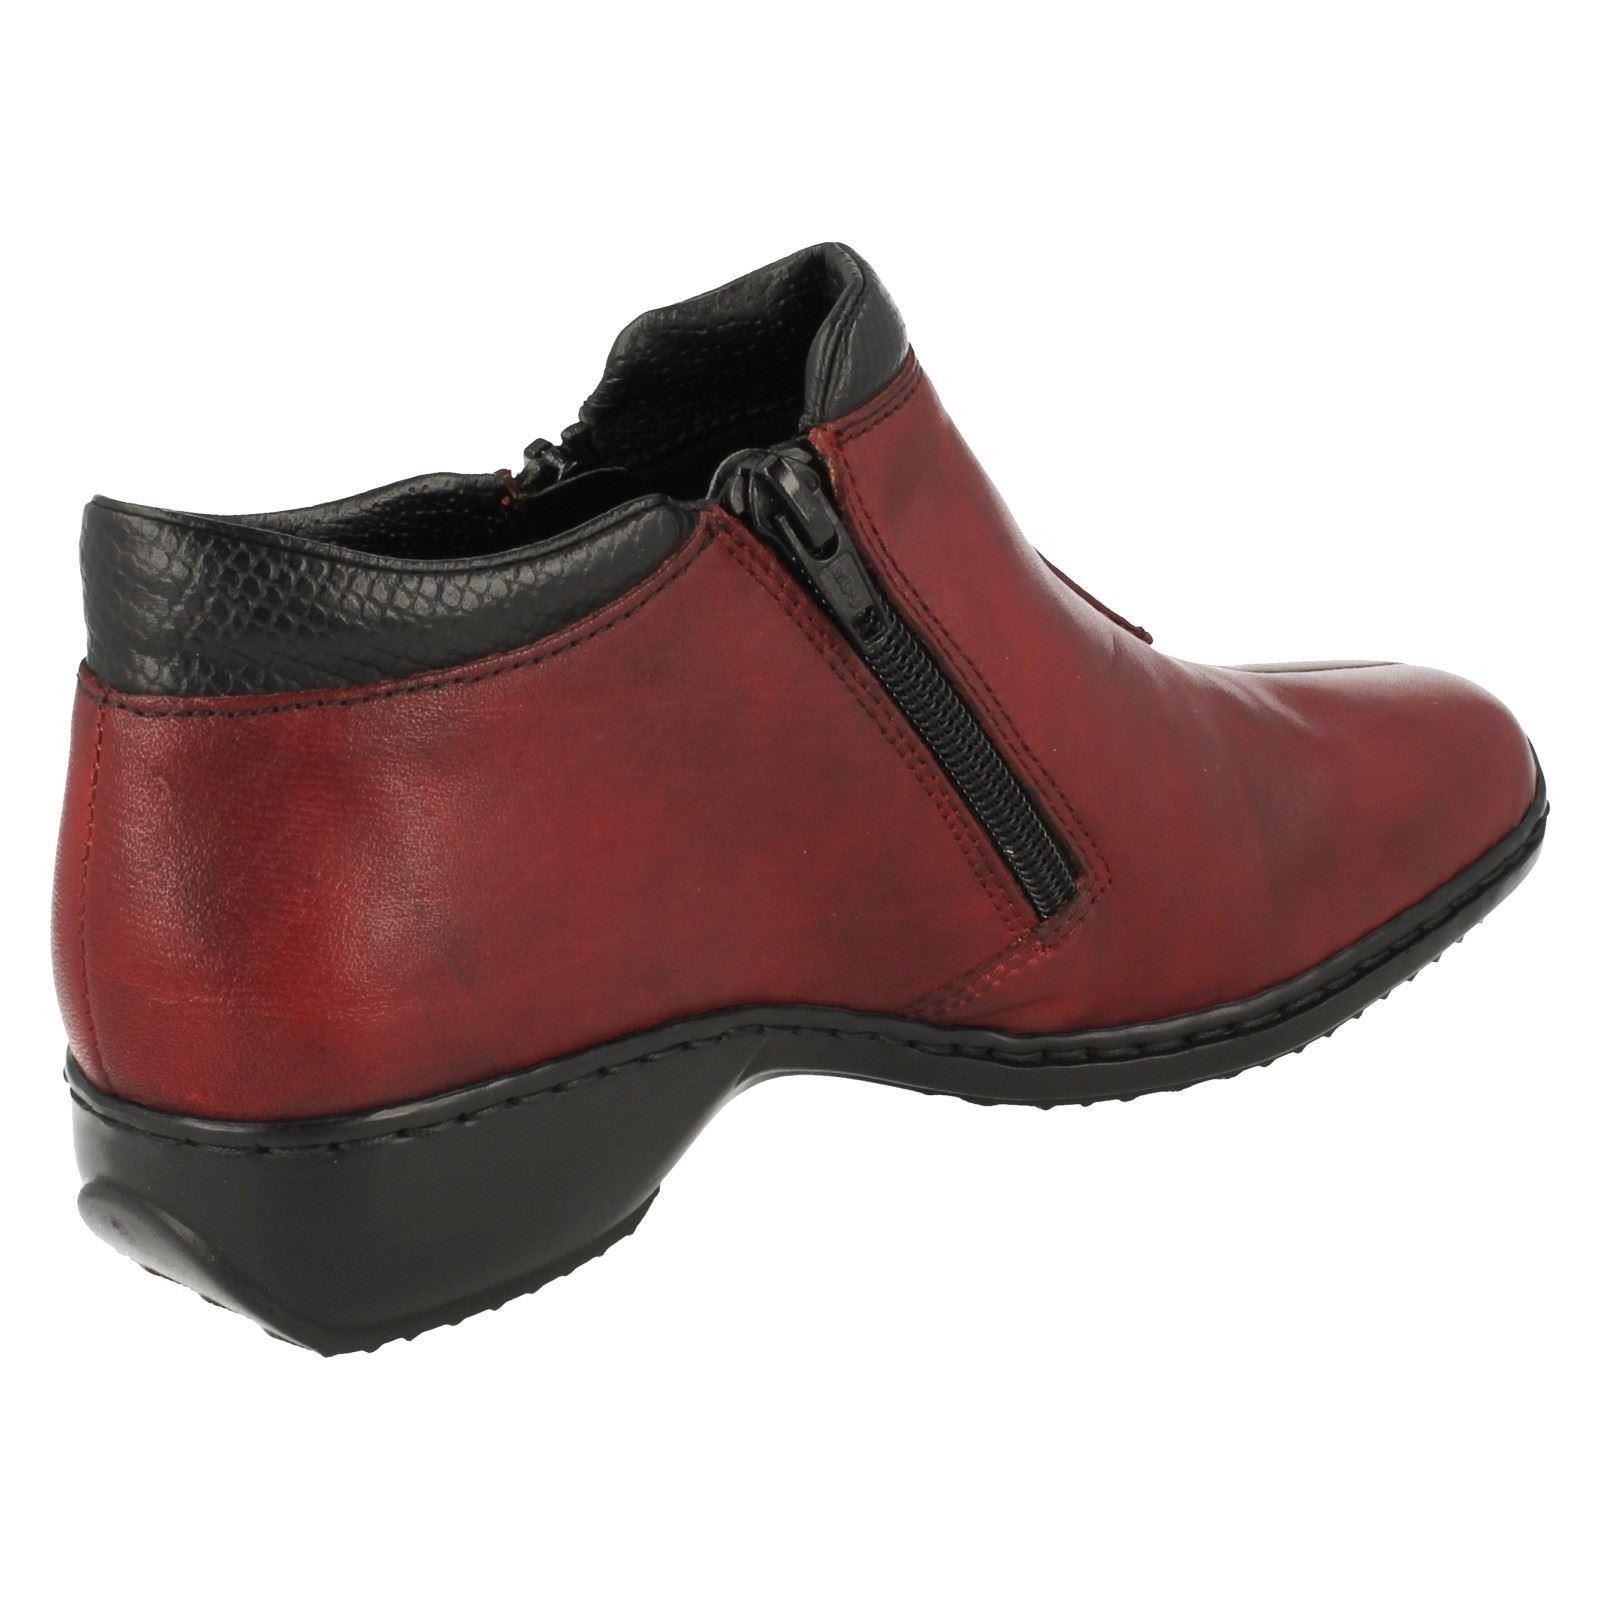 Ladies Rieker Rieker Rieker Causal Ankle Boots L3882 5effa3